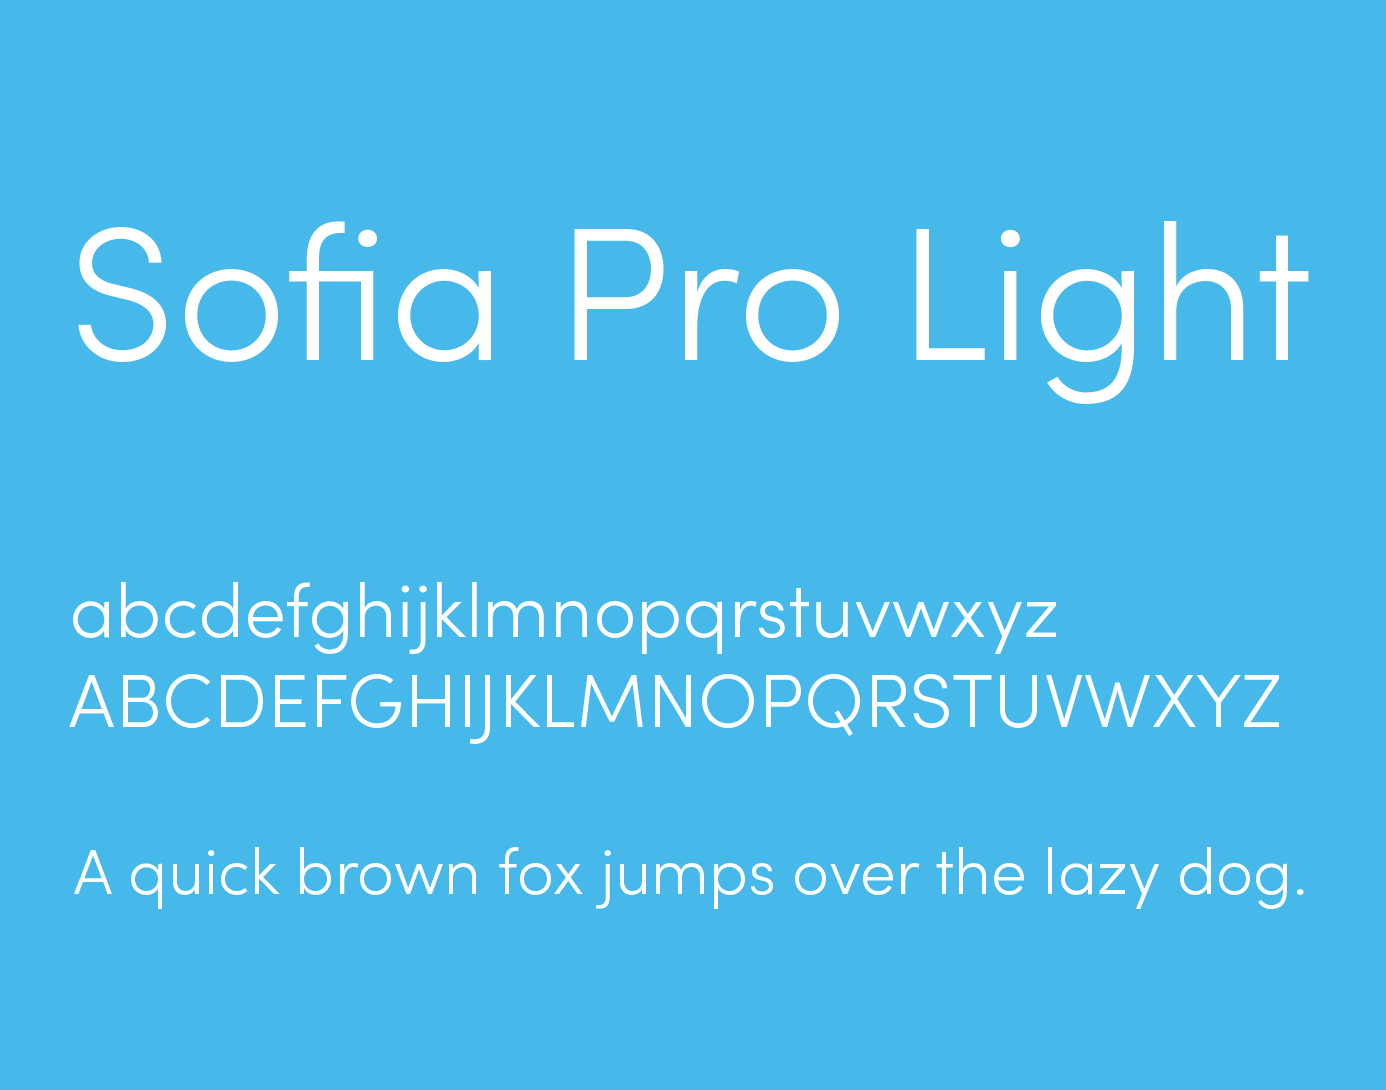 sofia-pro-light-font